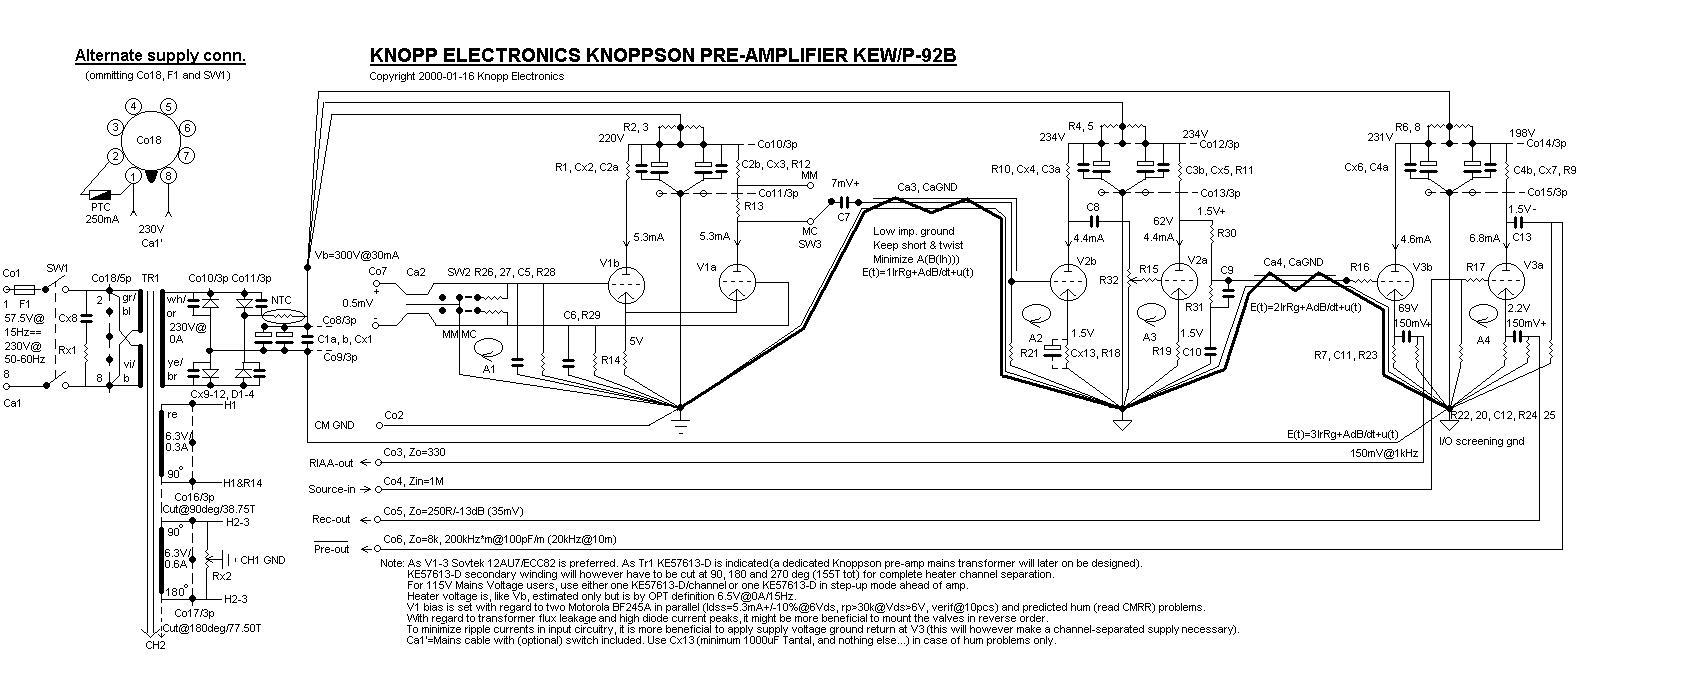 Knopp Voltage Tester : Roger s pre amplifier mk ii